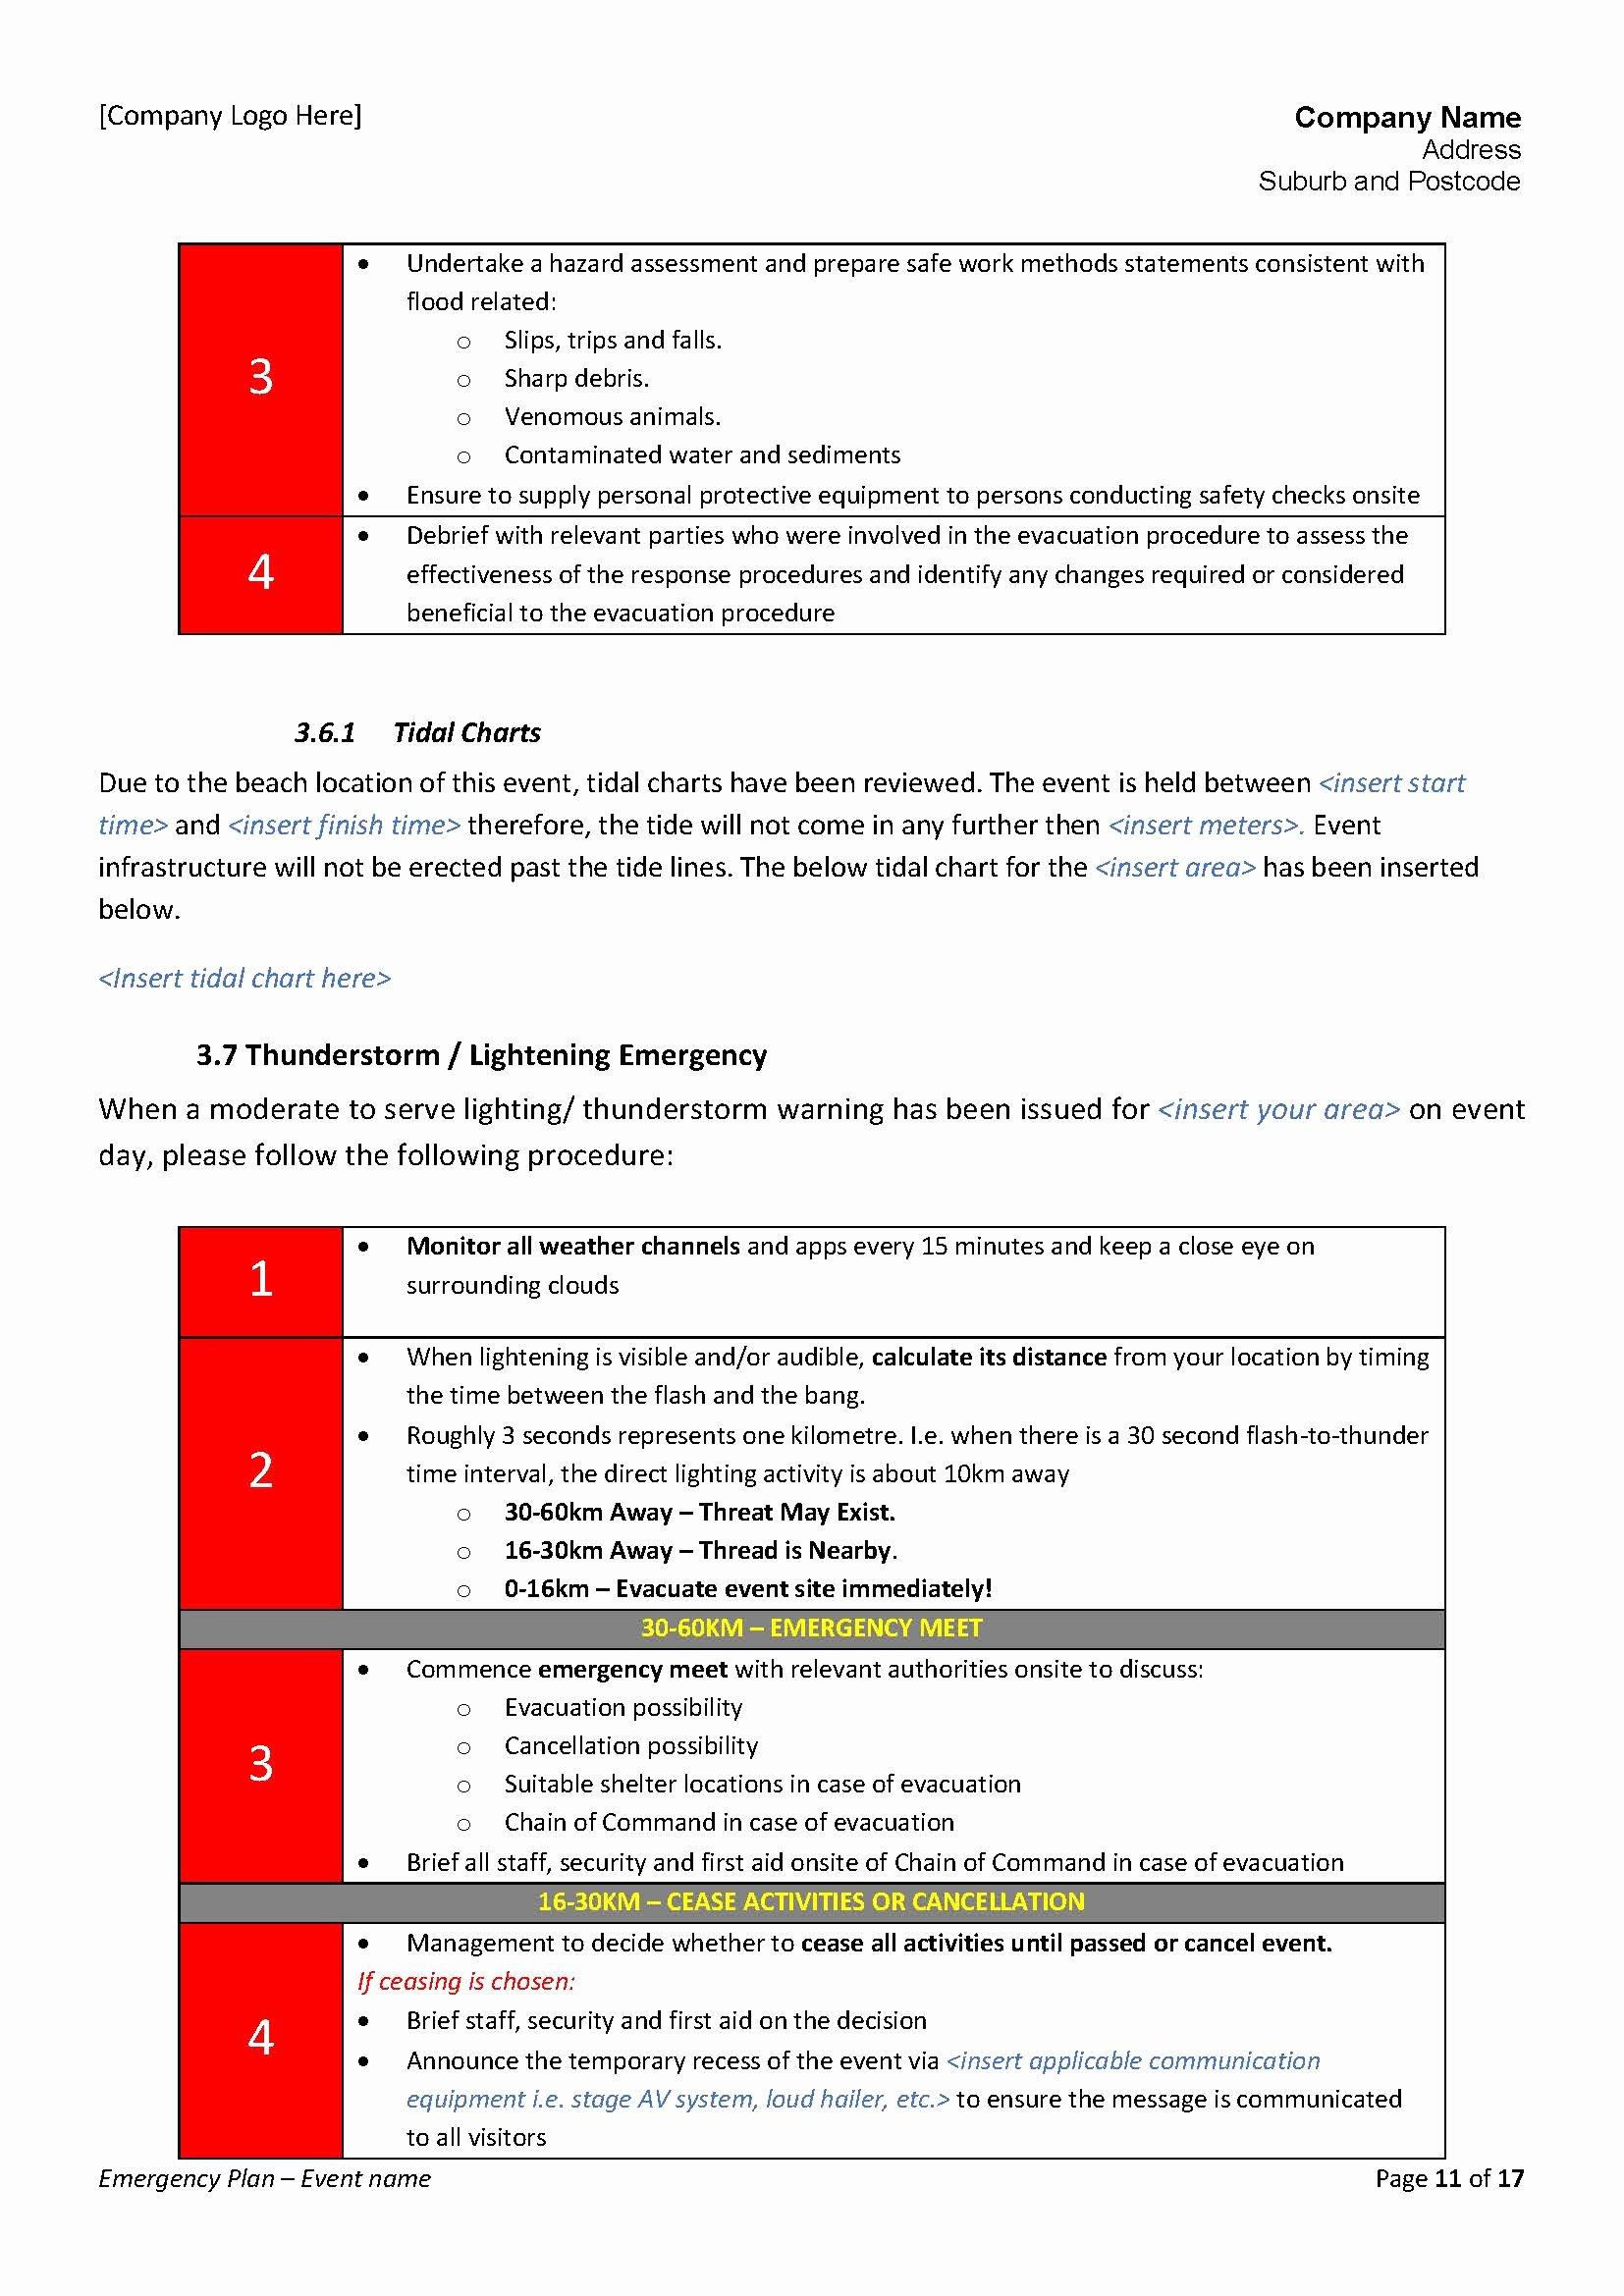 Emergency Management Plan Template Lovely event Management Plan Bundle Create Impressive Plans the